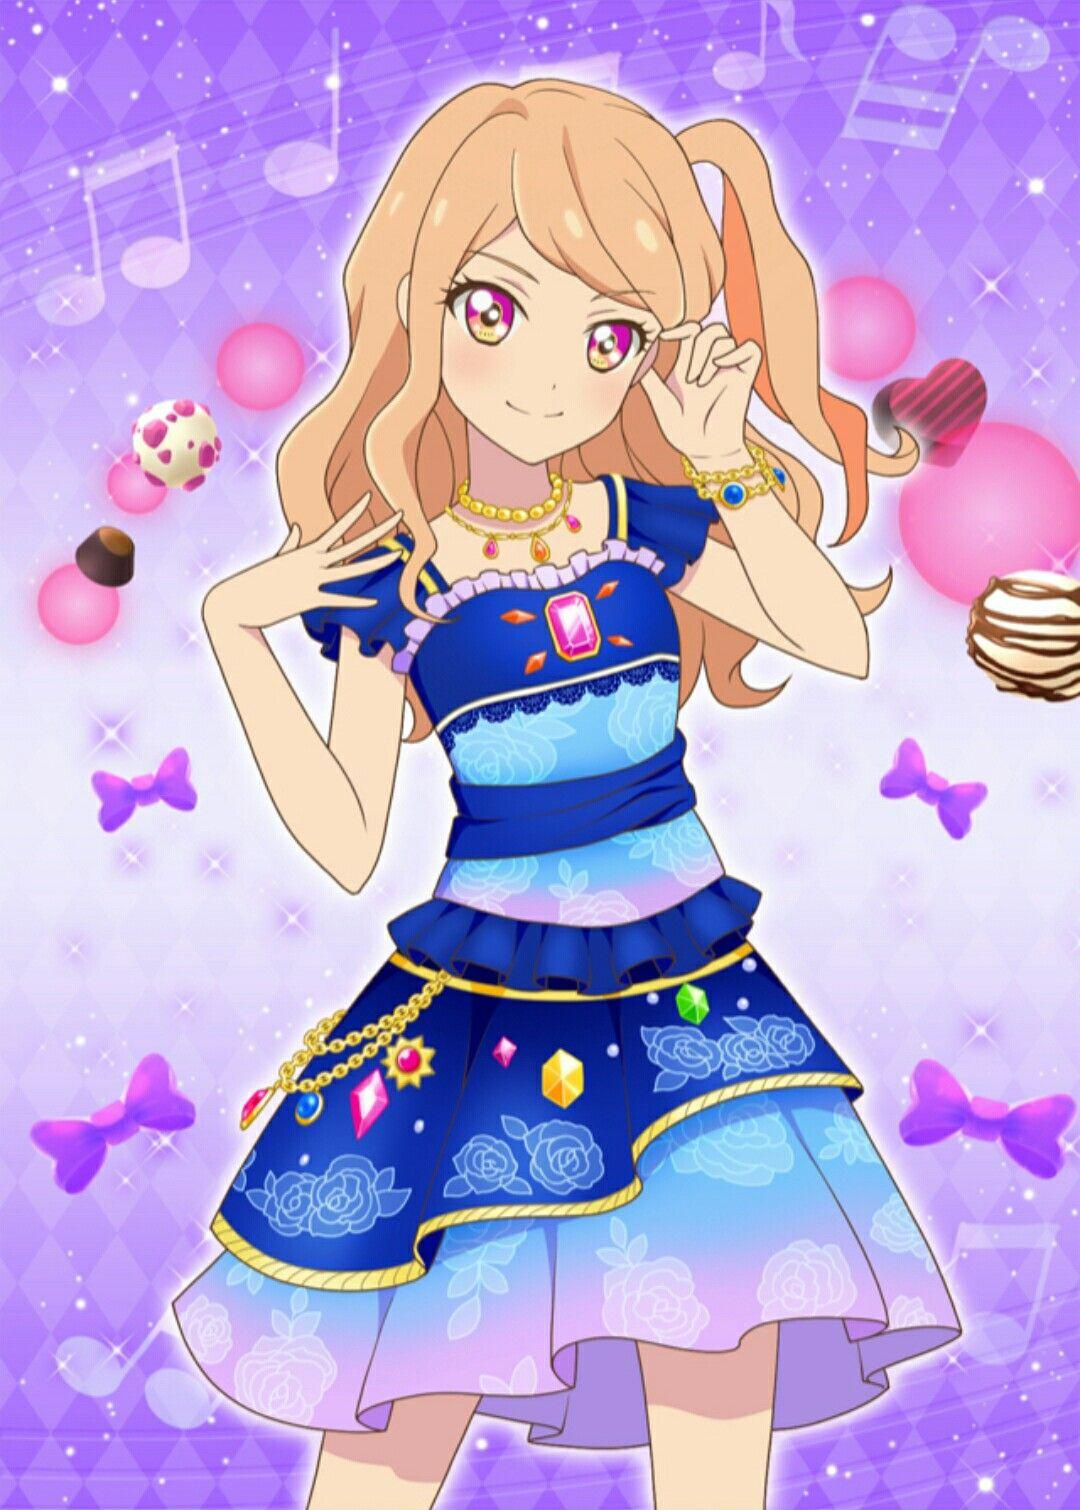 Phim Halloween 2020 Wiki Aikatsu! Photo on Stage!!/Cardlist/Page 2 trong 2020 | Anime, Phim